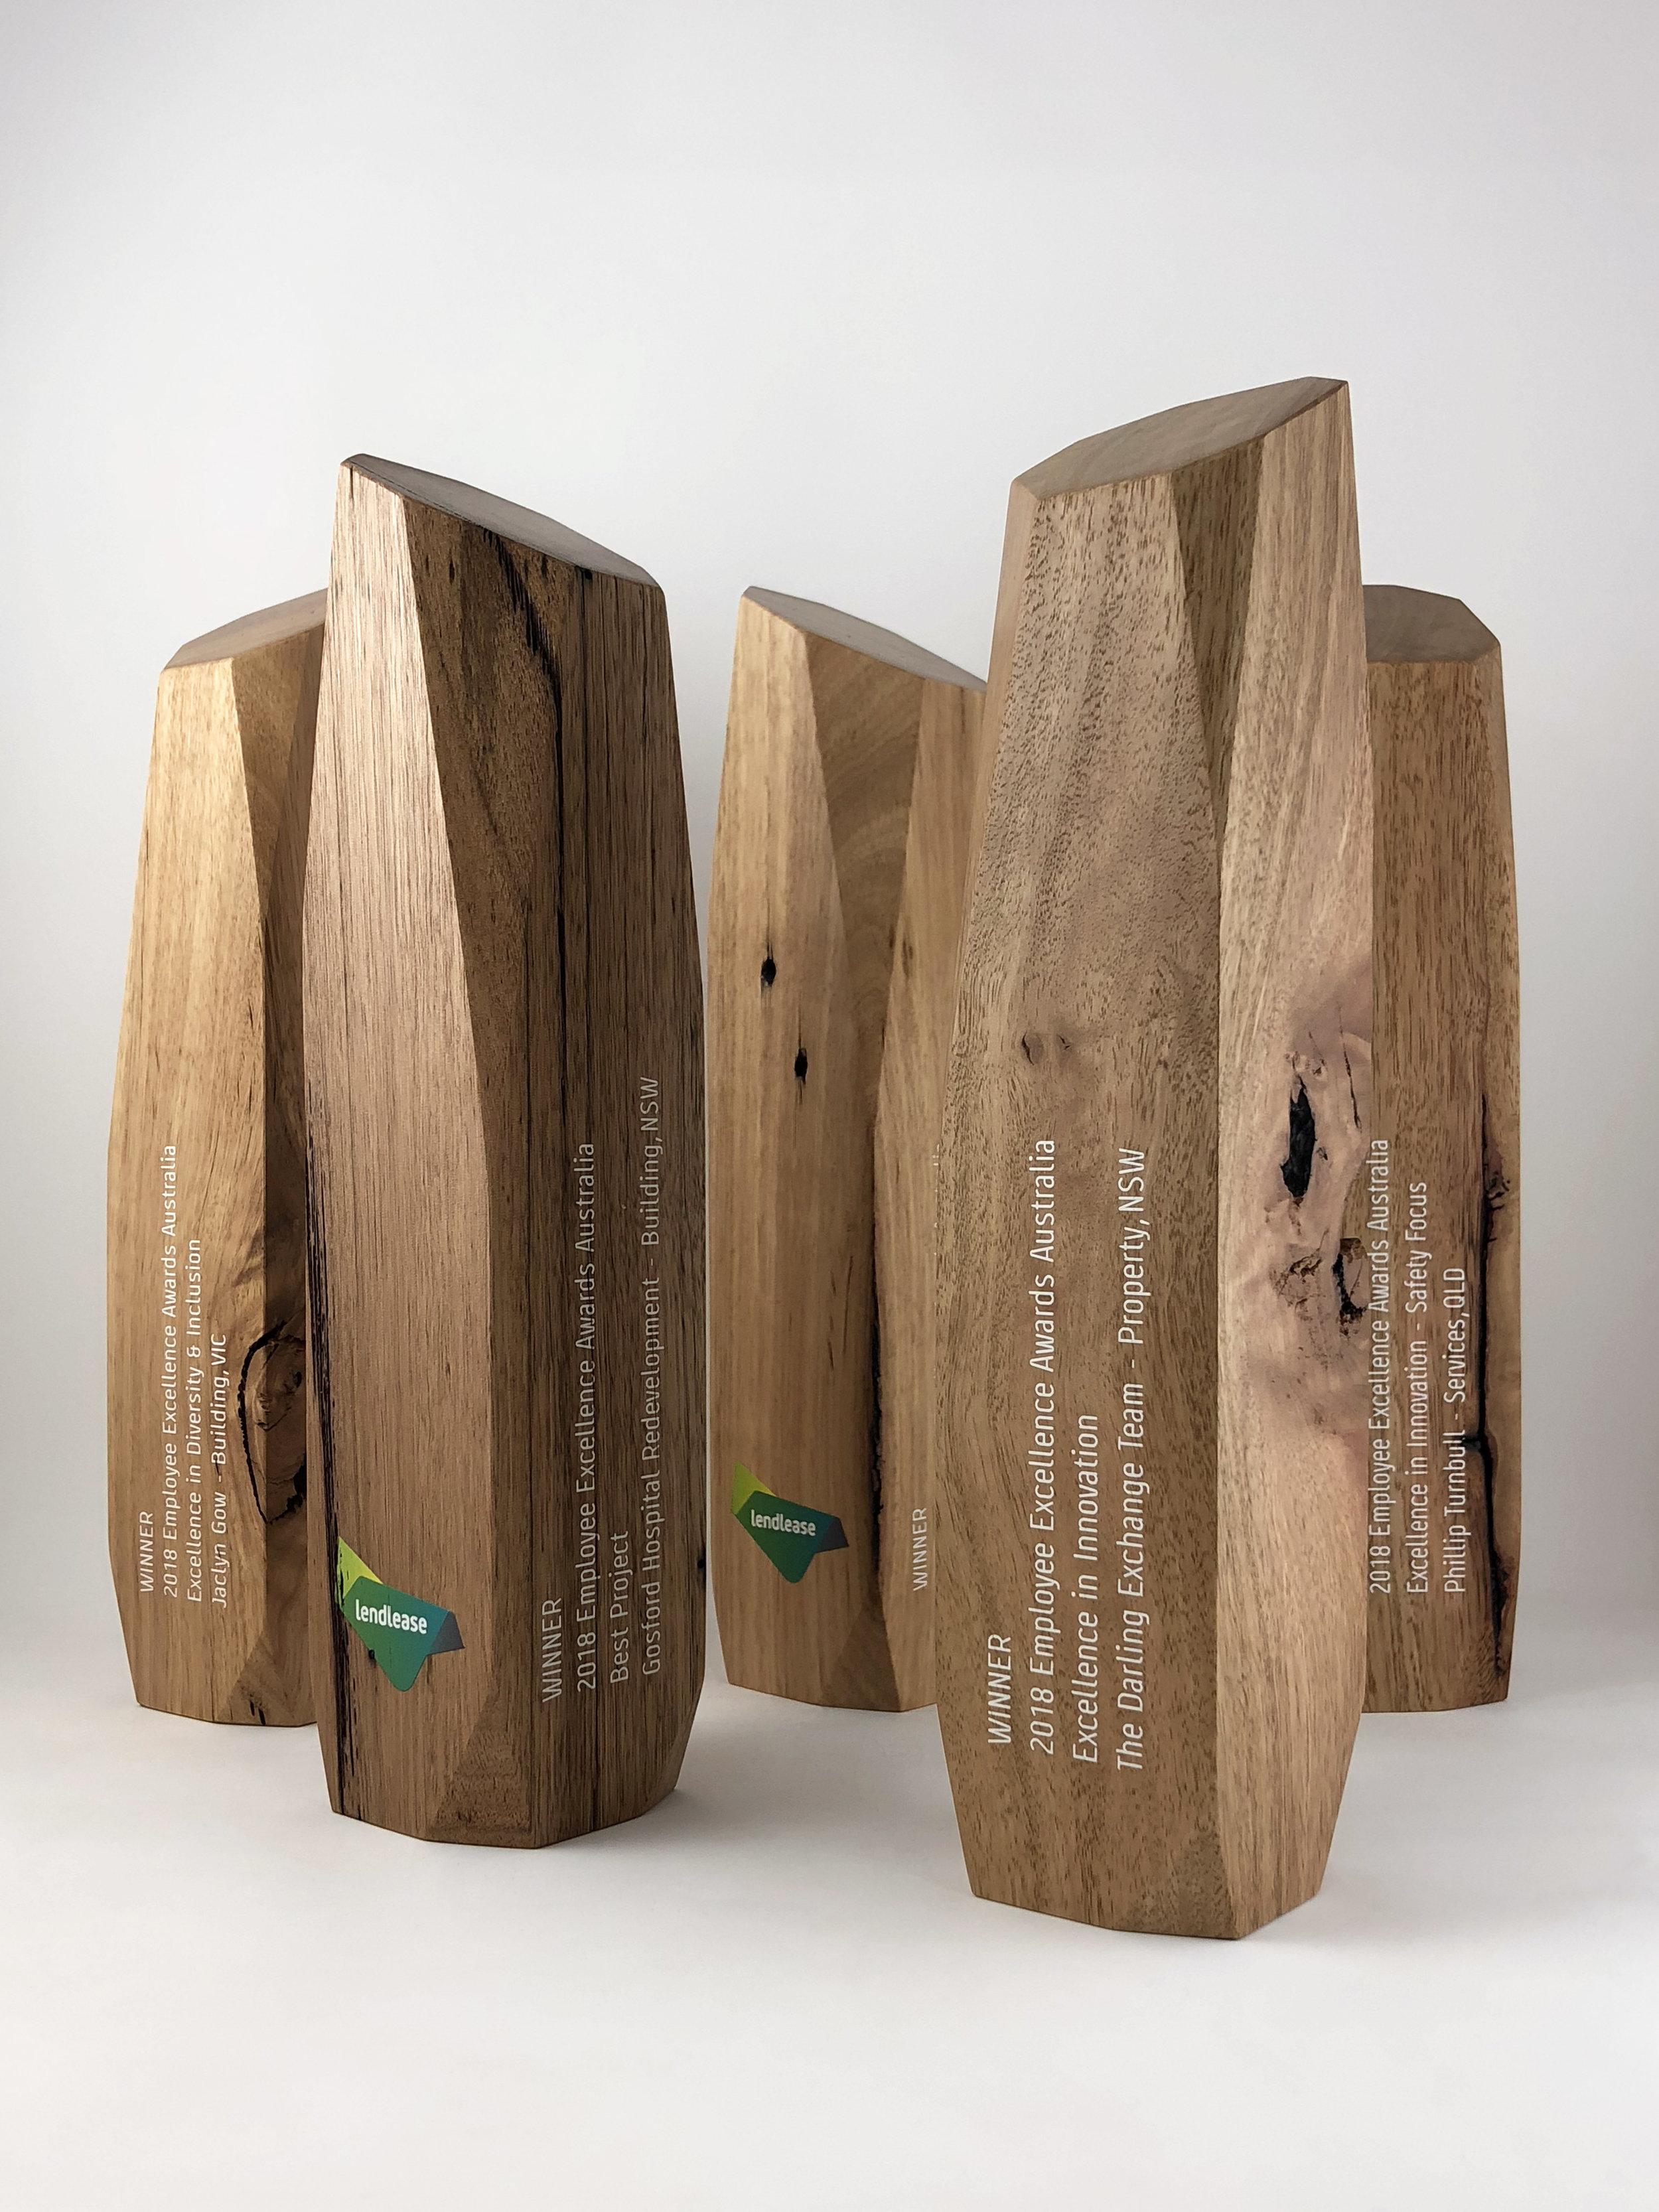 lendlease-reclaimed-timber-awards-trophy-01.jpg